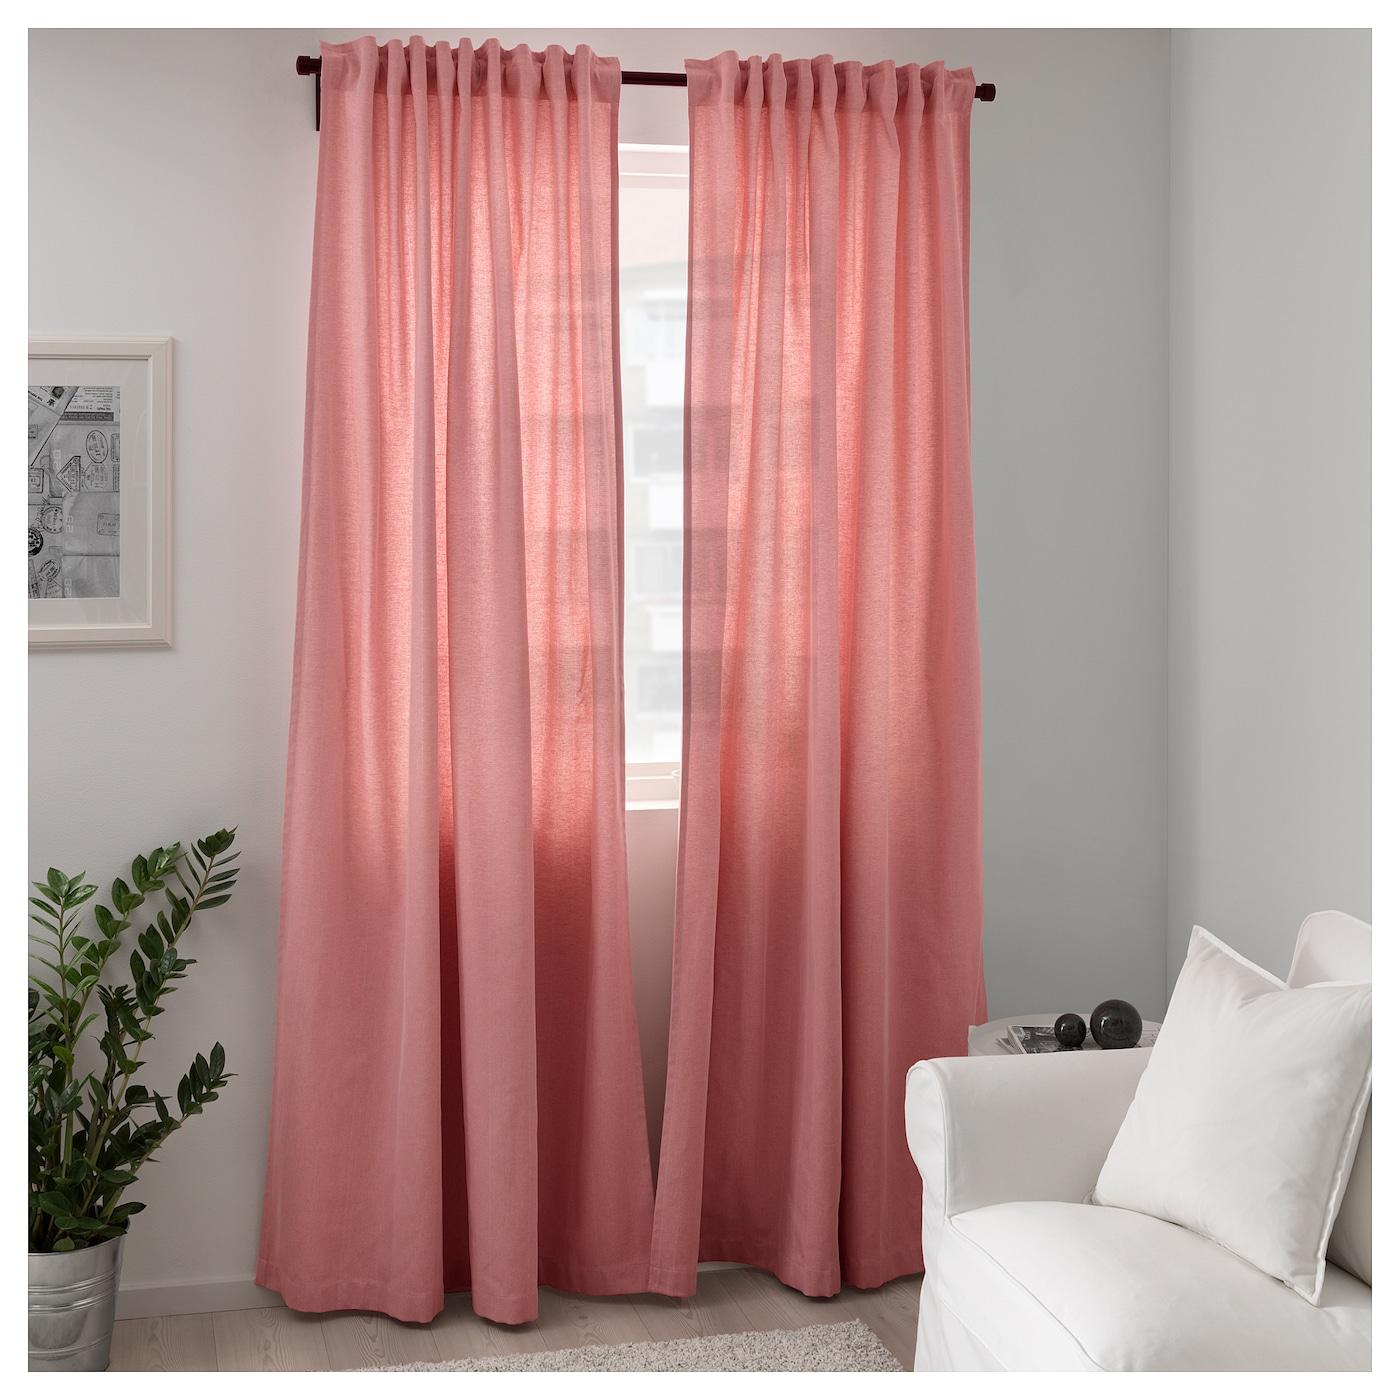 TIBAST Gordijnen, 1 paar Roze 145 x 300 cm - IKEA